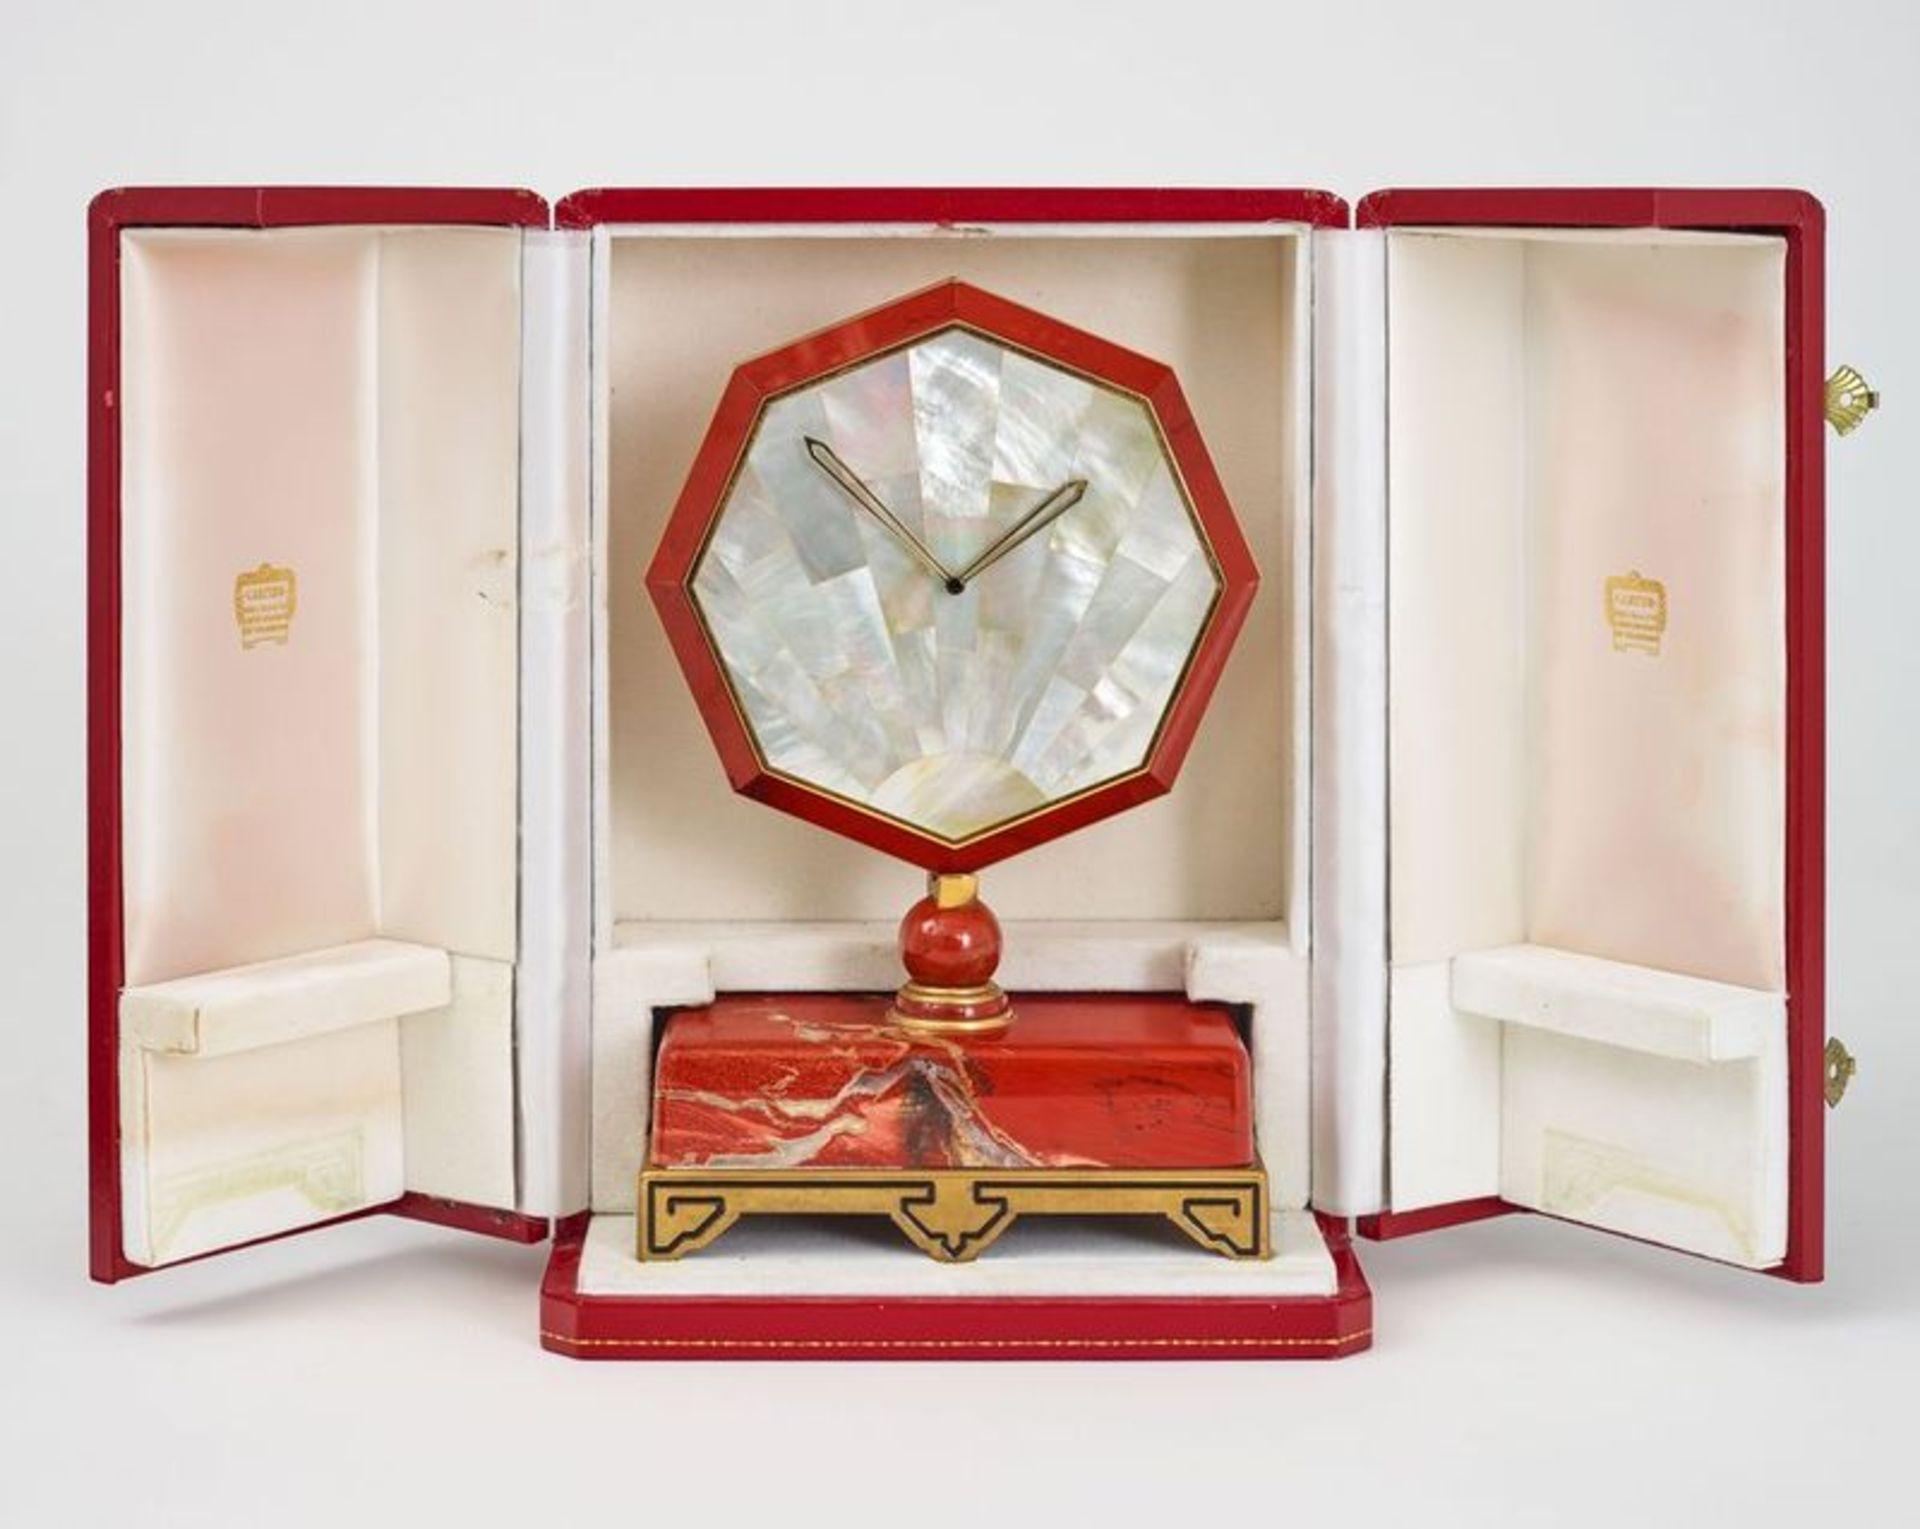 ART DECO STYLE TABLE CLOCK, CARTIER PARIS, 1980 - Rare and elegant Art Deco [...]